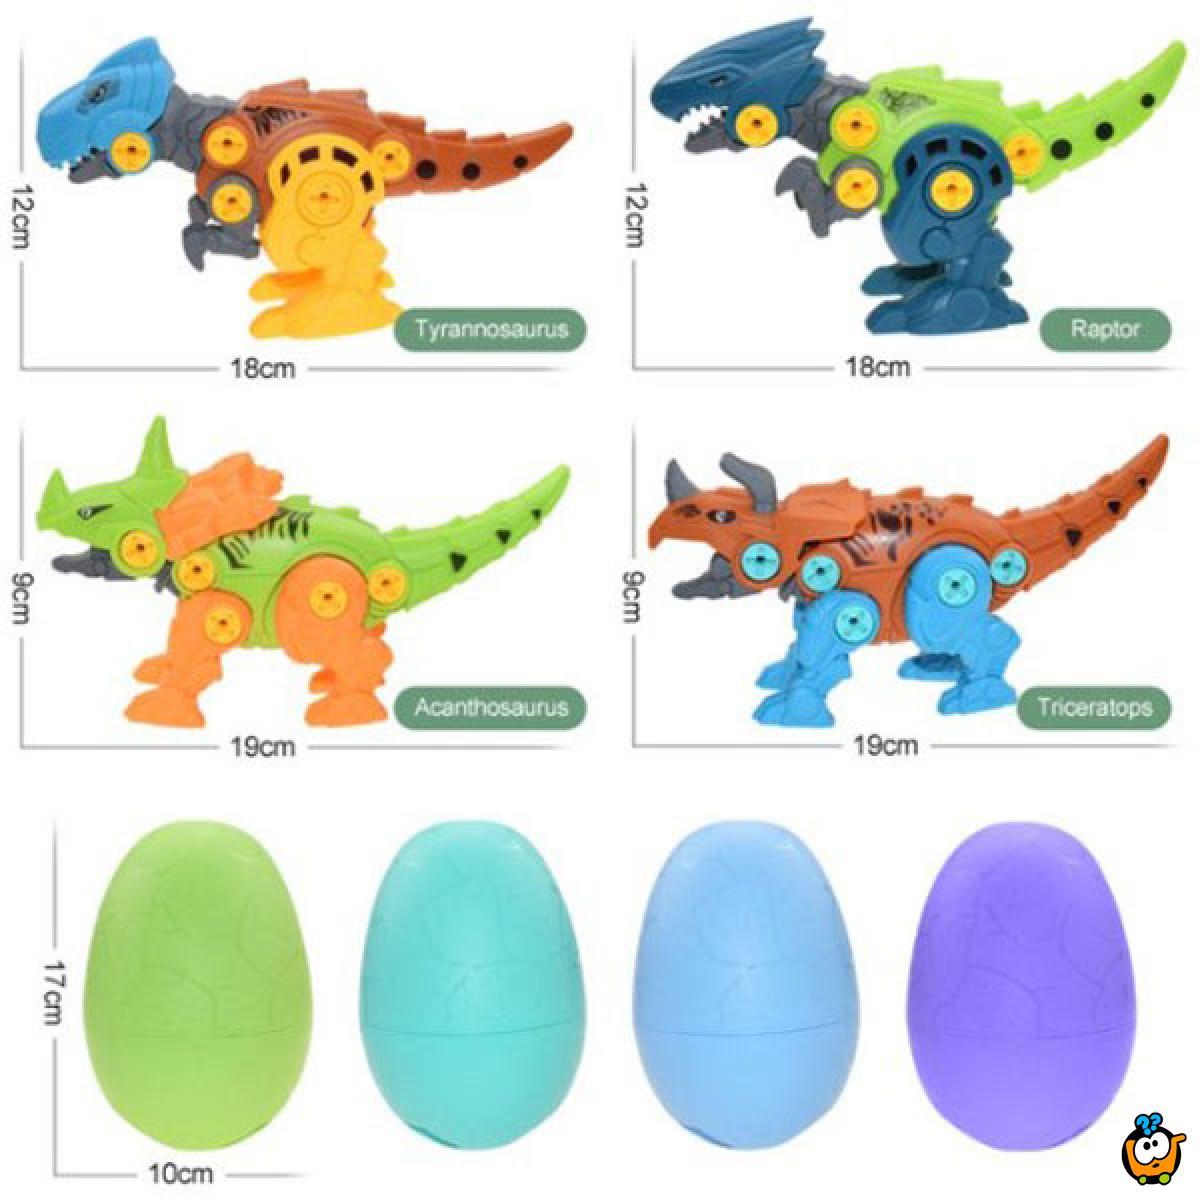 Inženjerski komplet za sklapanje dinosaurusa